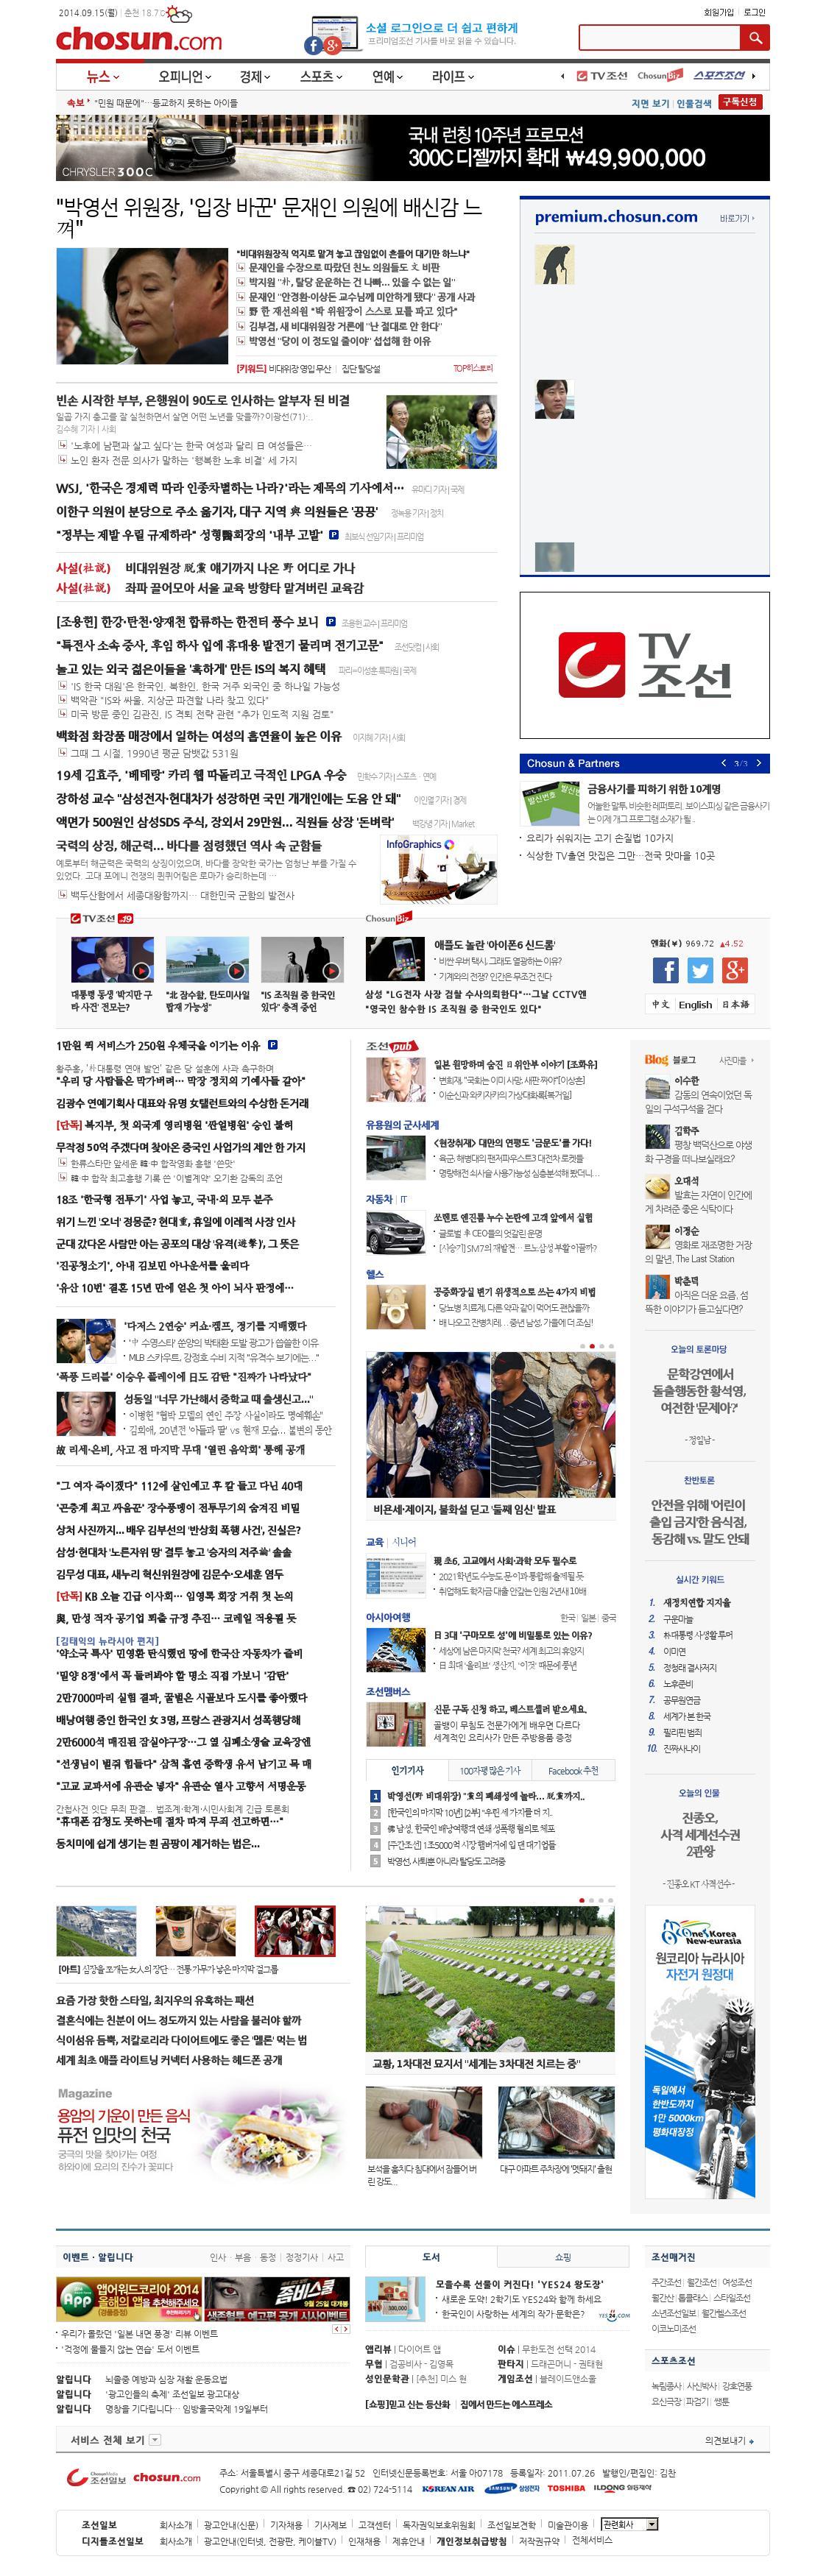 chosun.com at Monday Sept. 15, 2014, 1:03 a.m. UTC